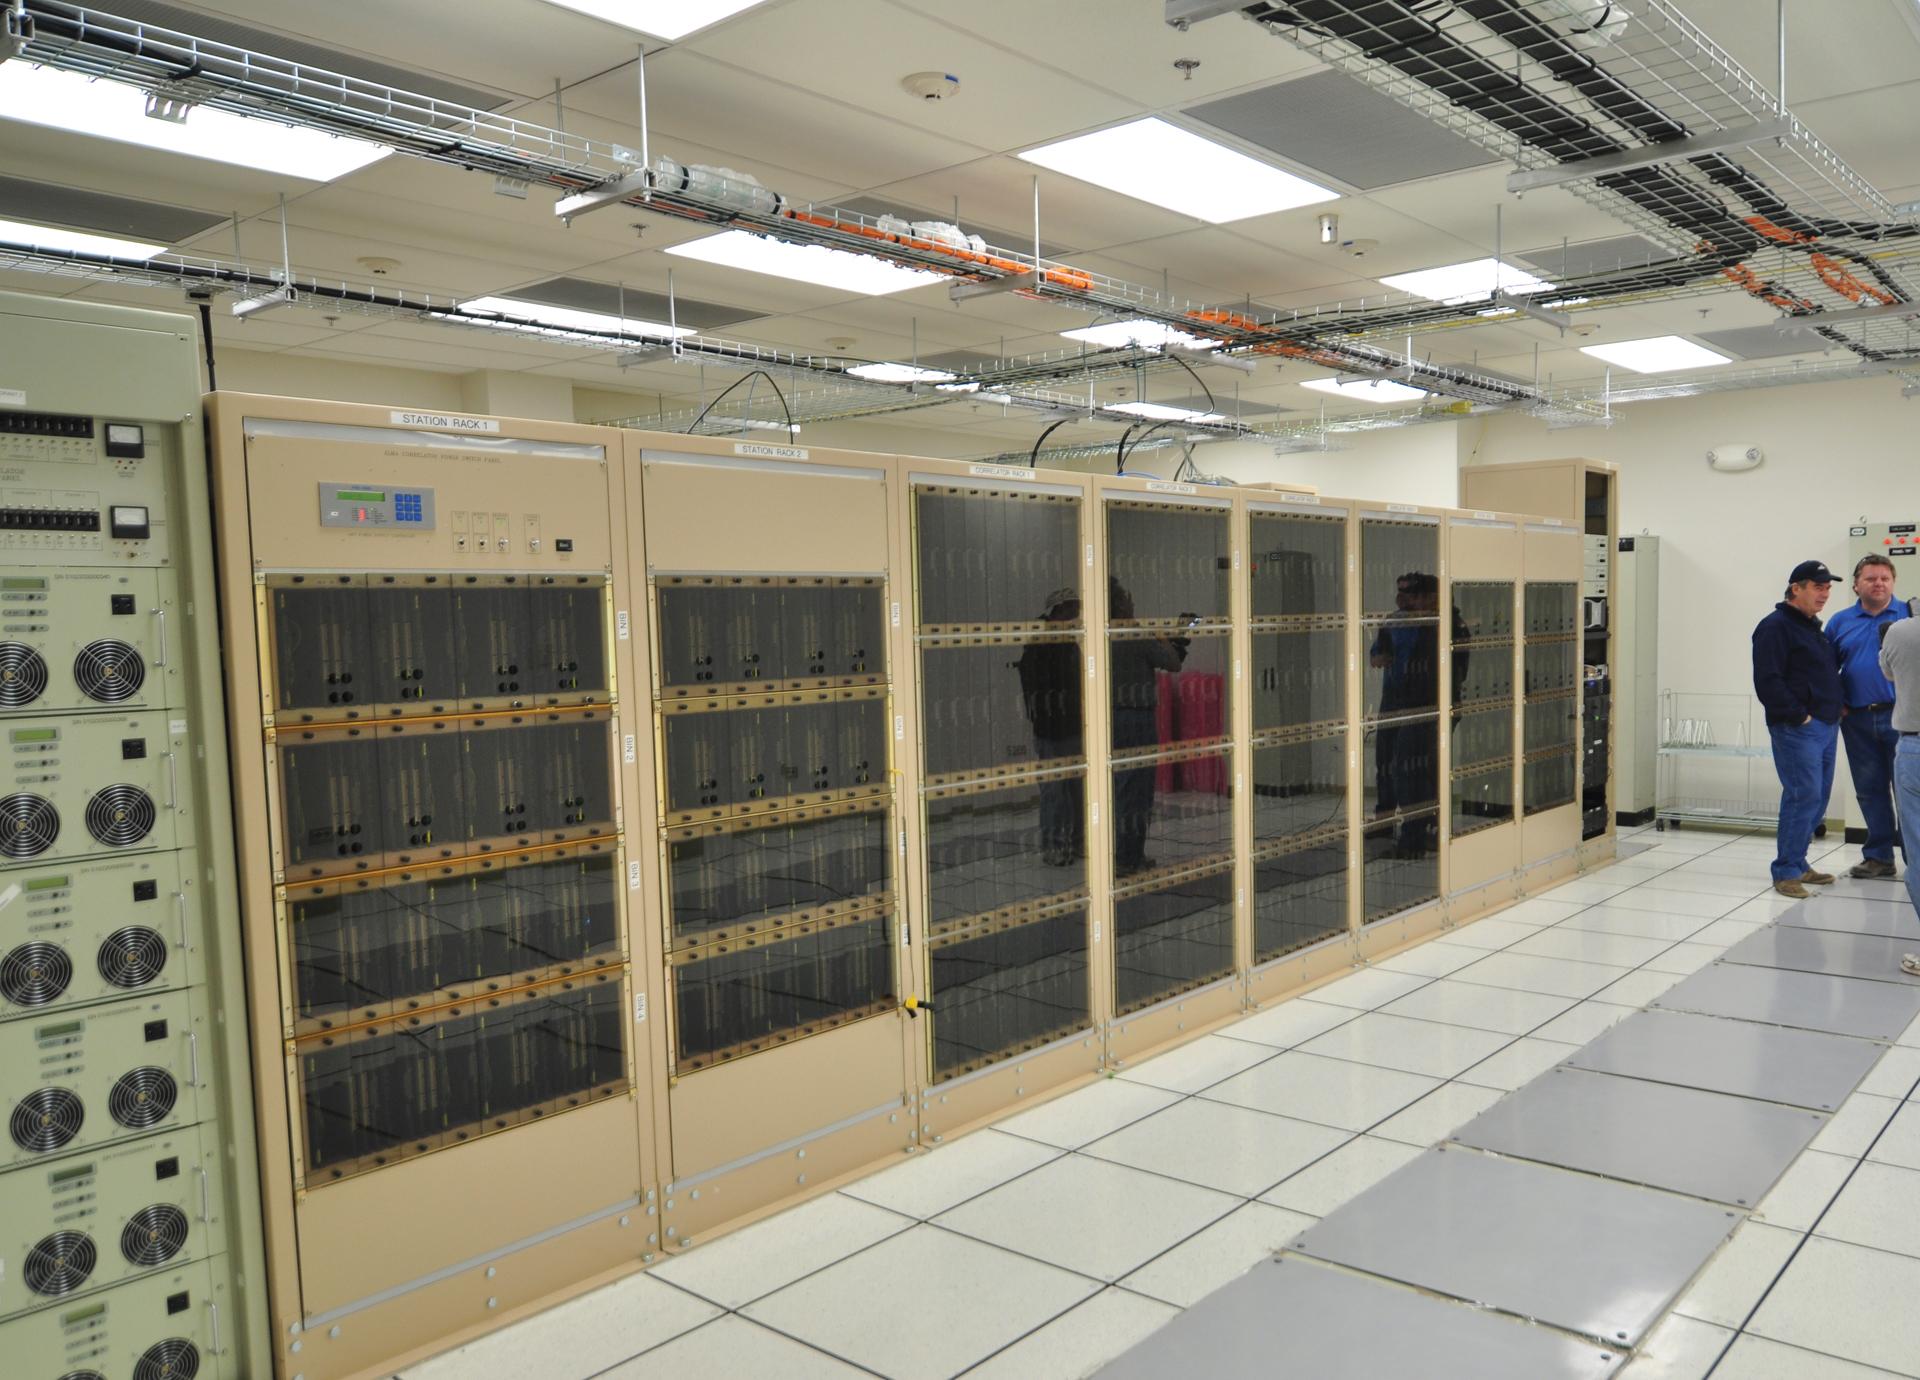 ALMA's Supercomputer